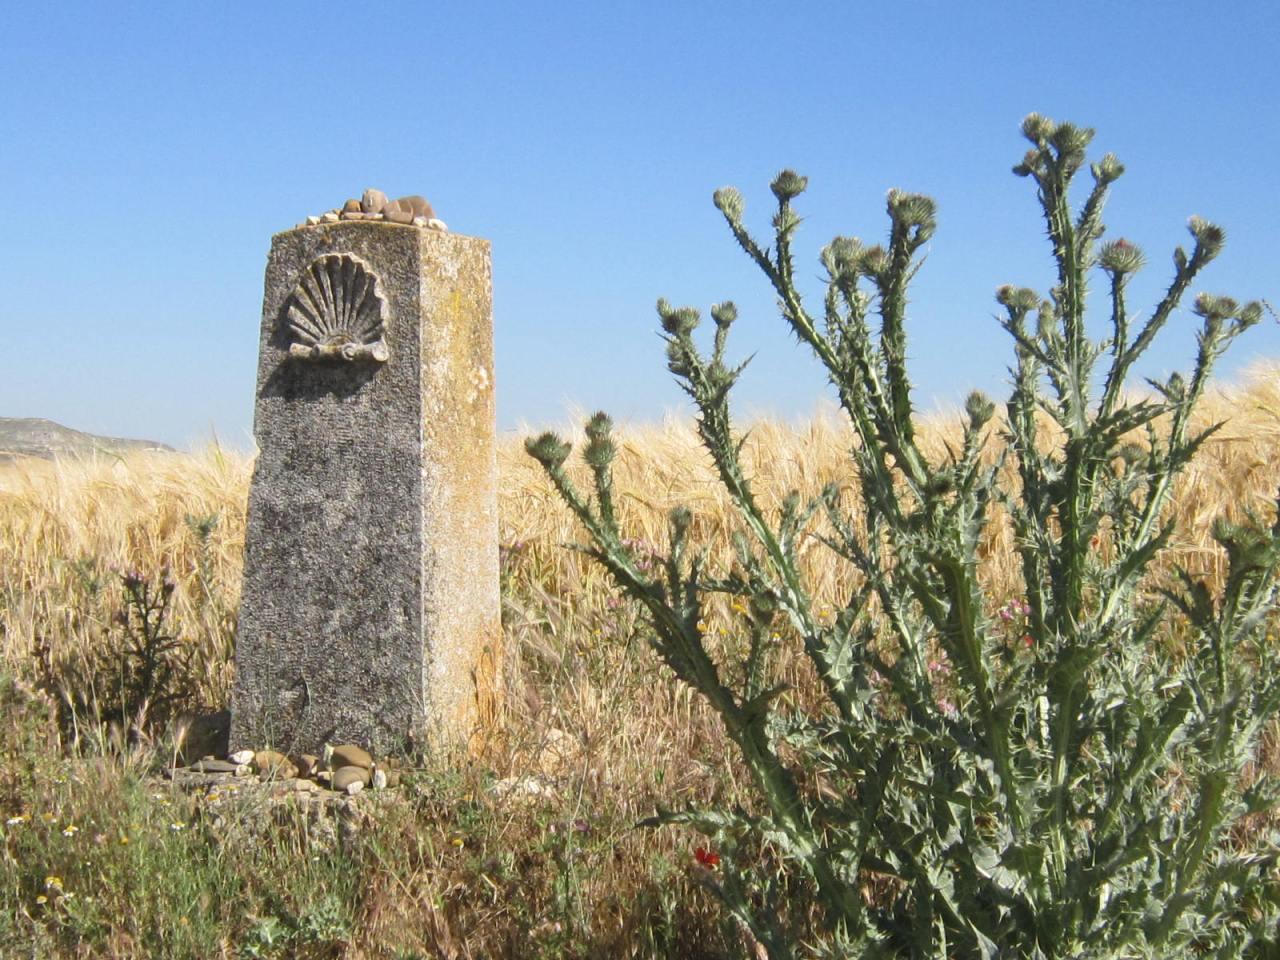 Camino sign on the Meseta